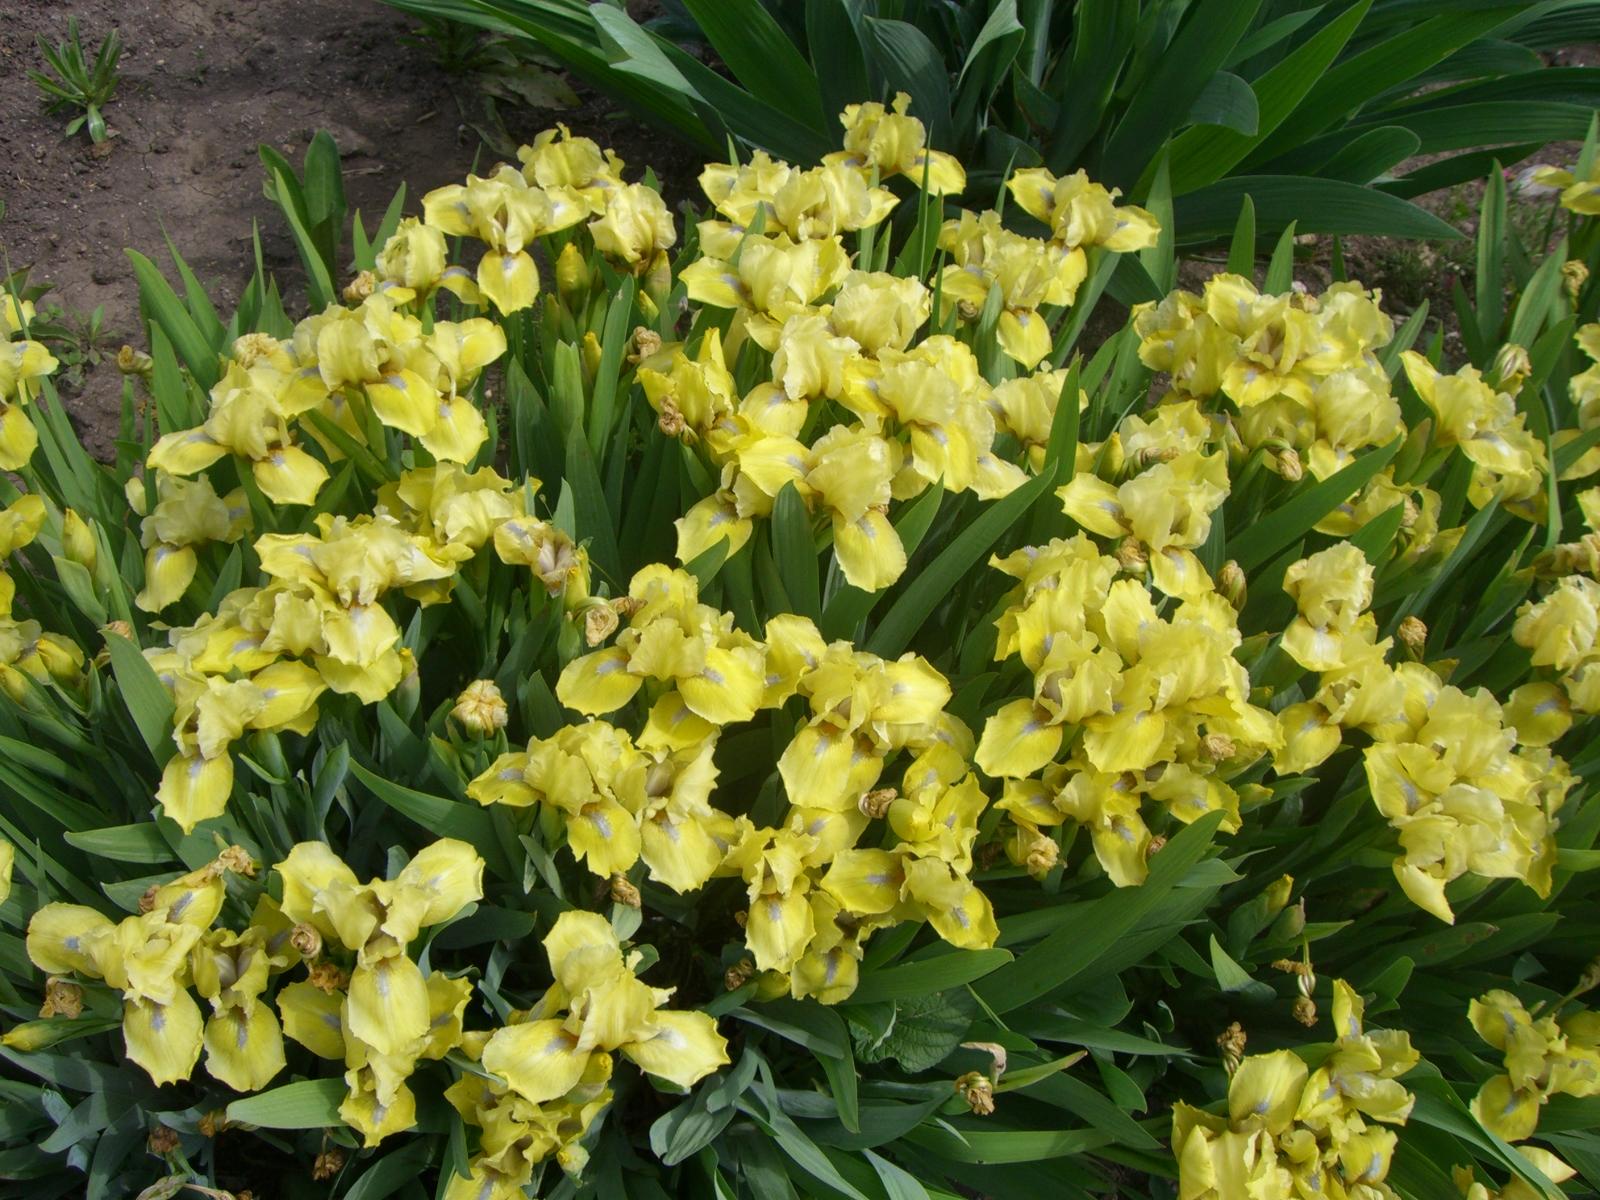 Ирисы – выращивание и уход - Сад 6 соток